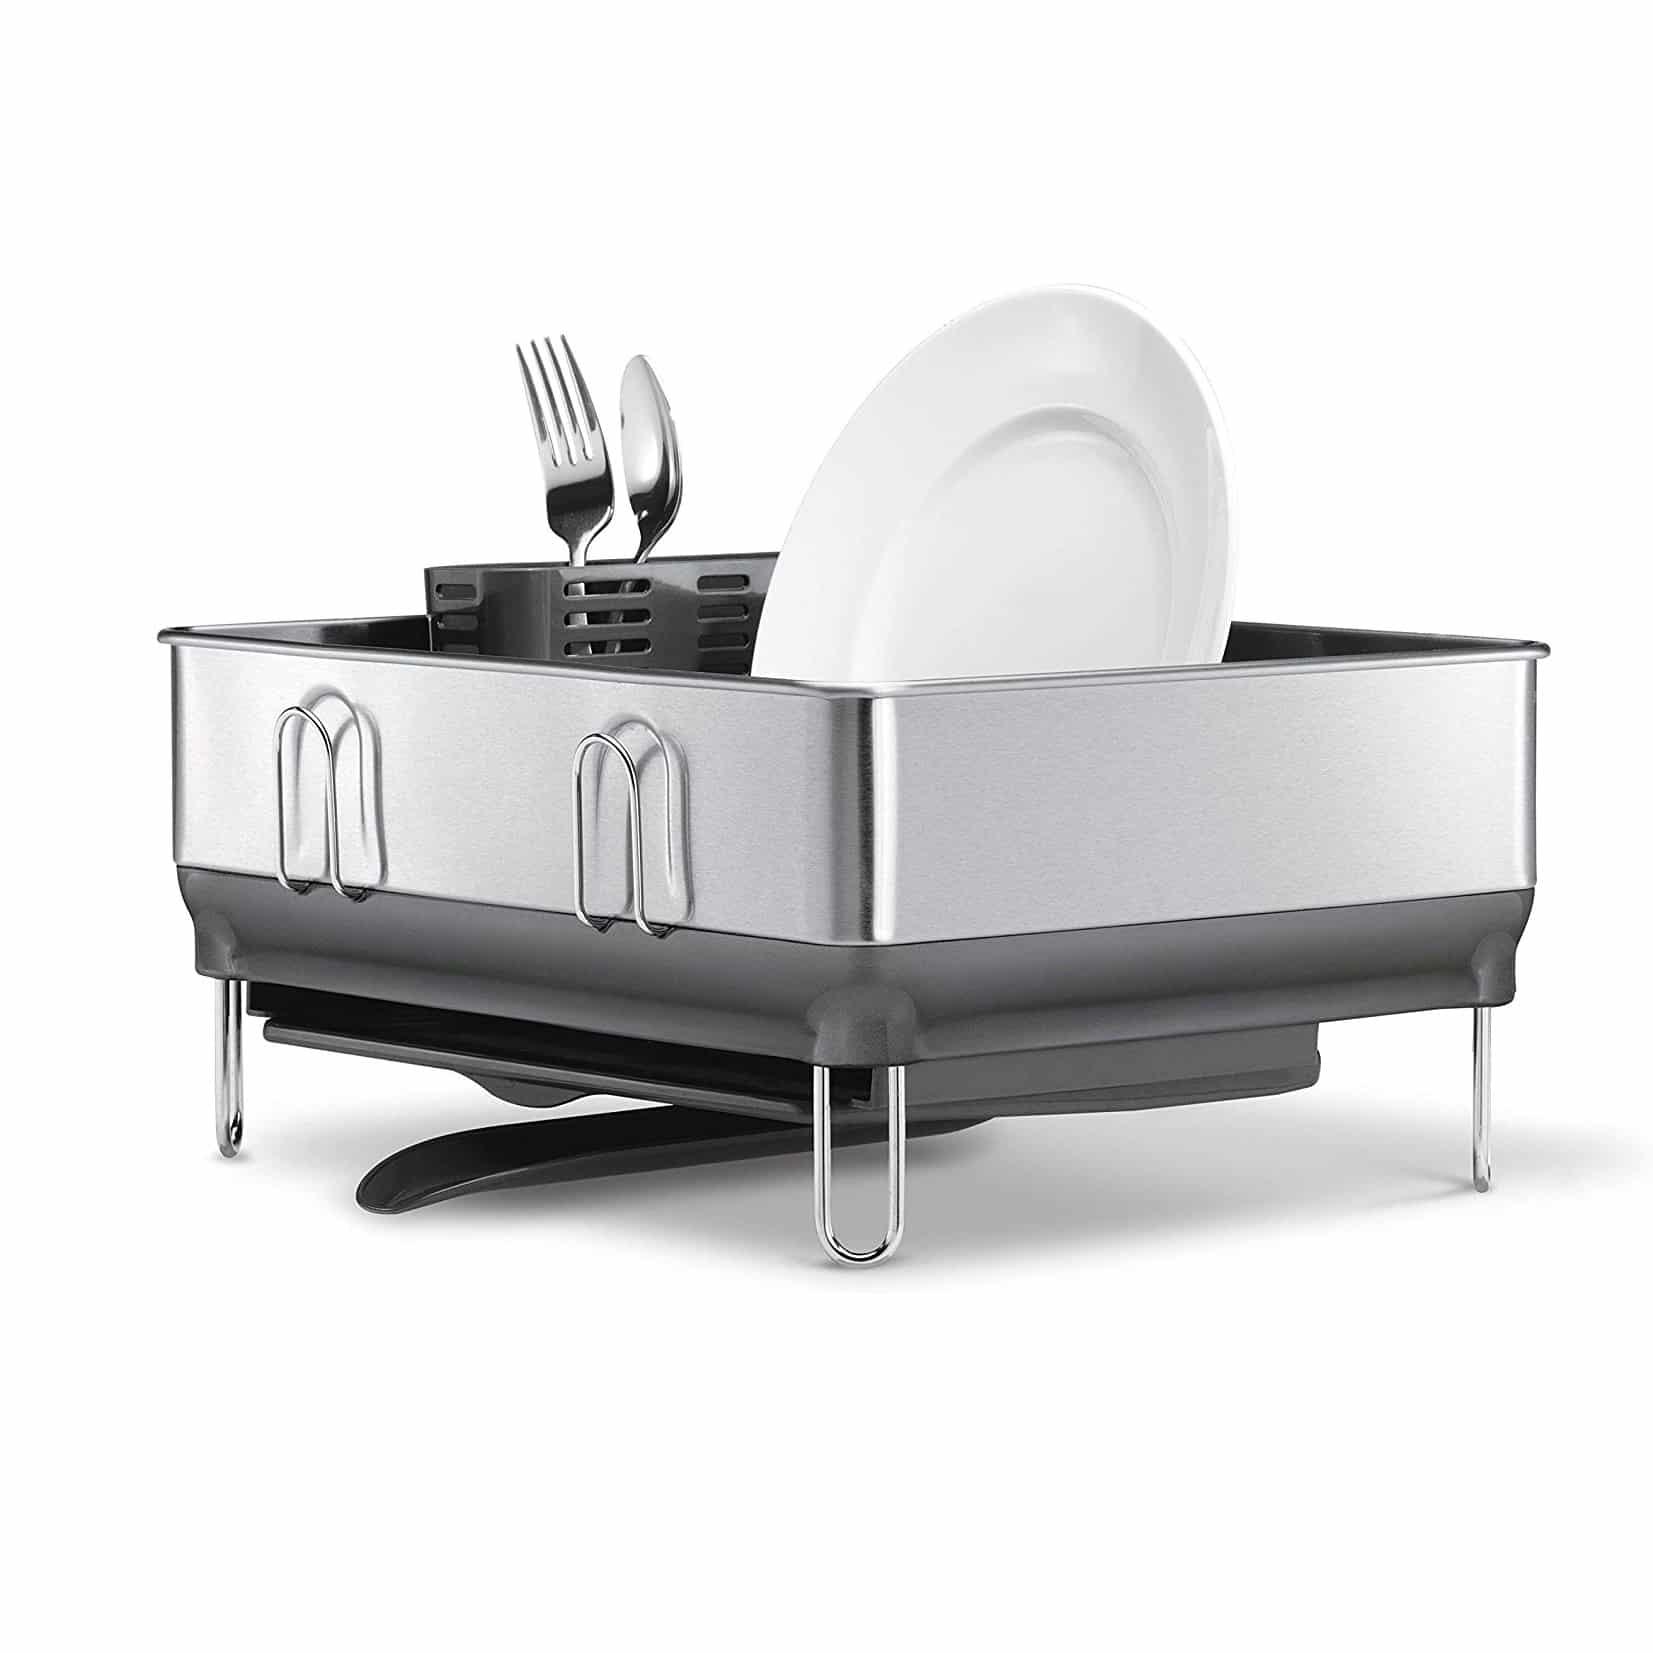 Simplehuman Kitchen Compact Dish Rack